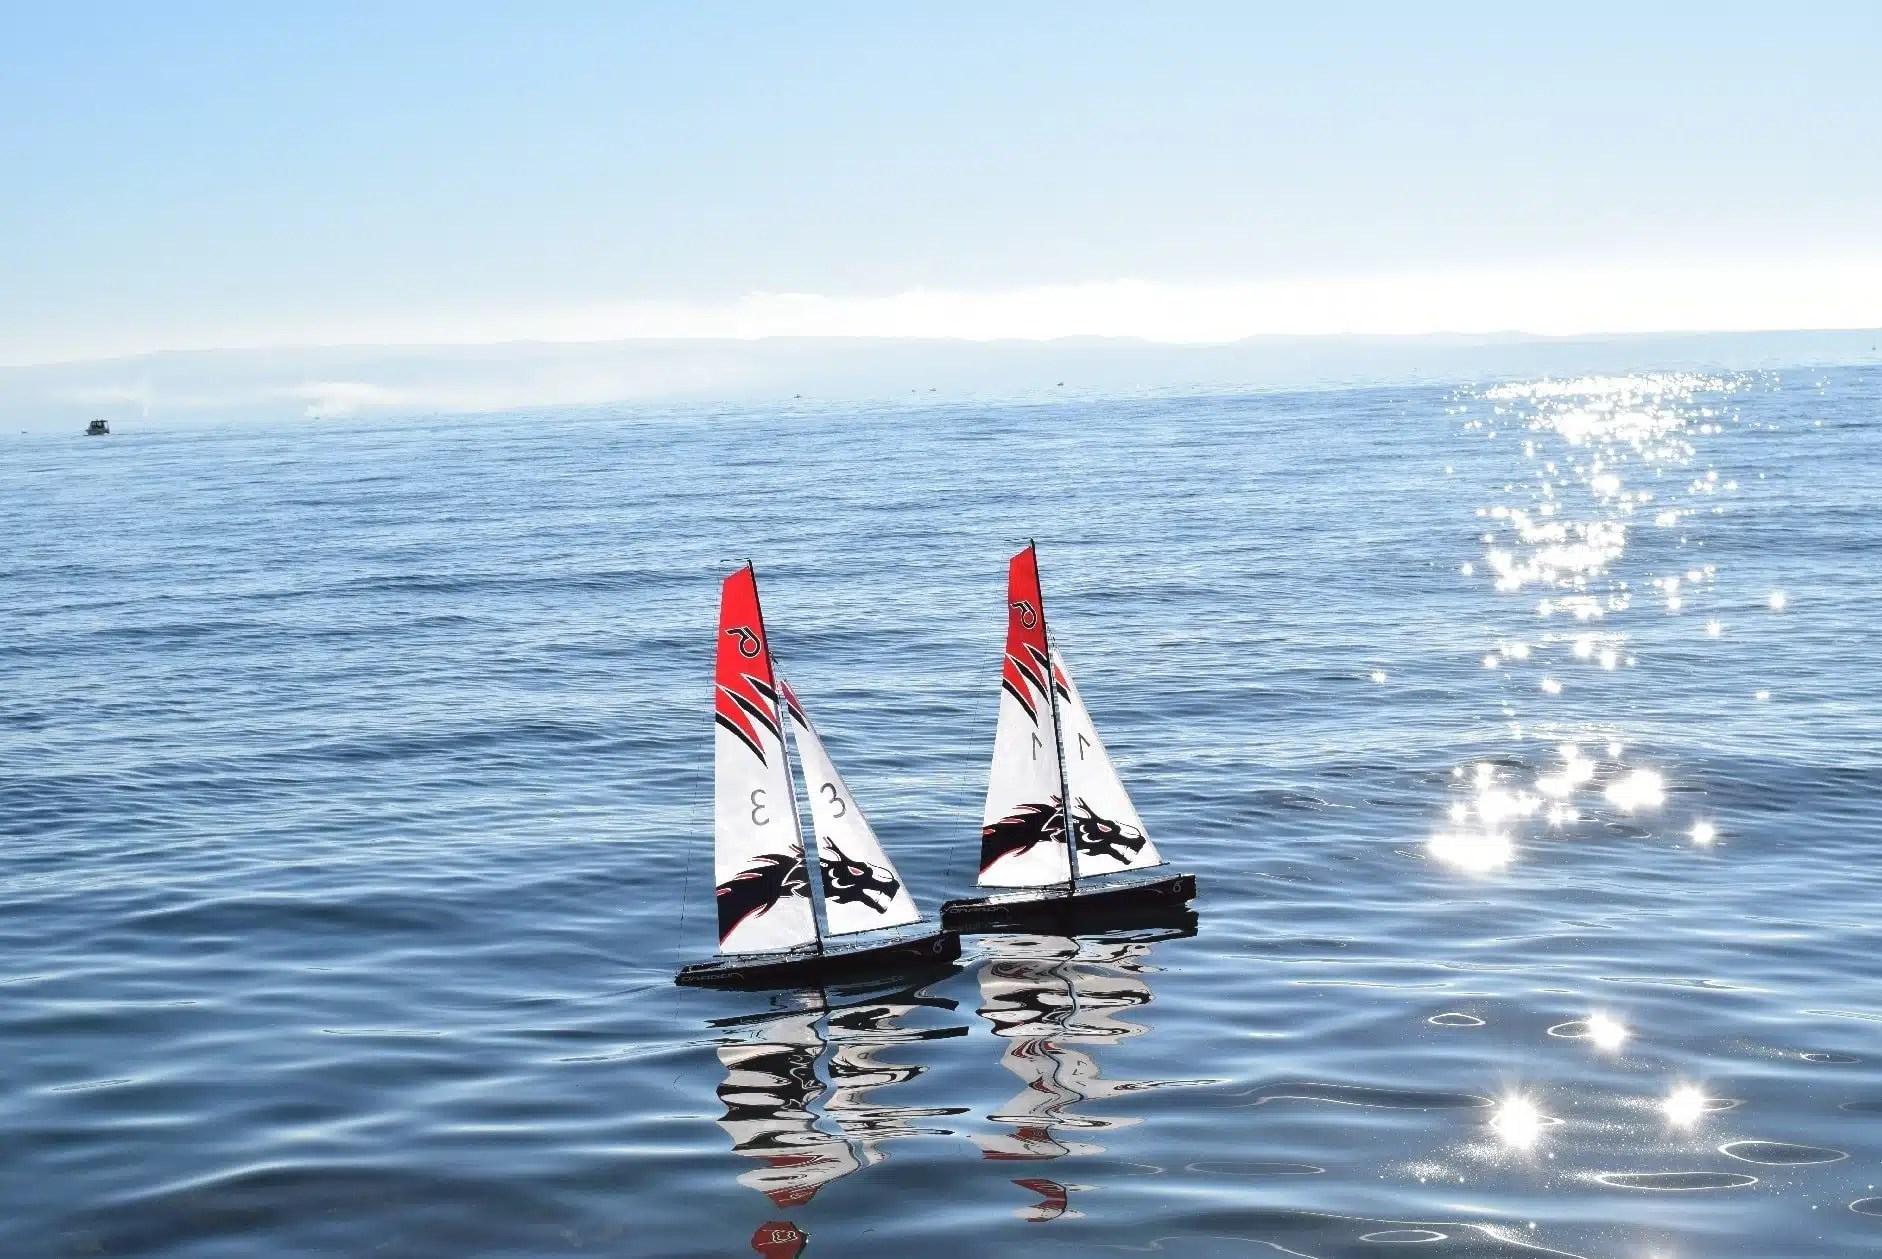 DragonForce 65 V5 Black RC Sailboat / RC Yacht